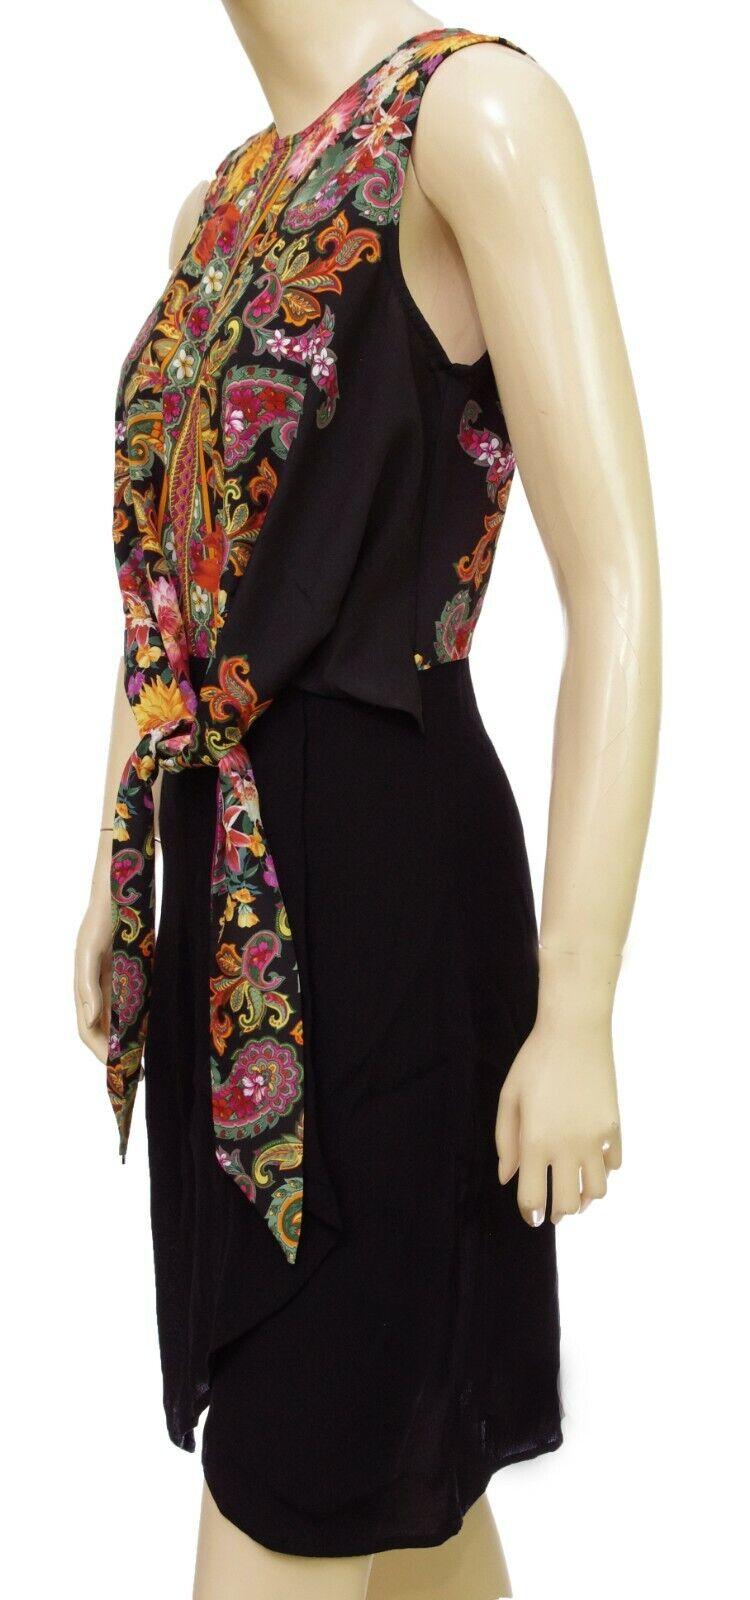 Desigual VEST VILMA 19SWVWAA robe courte femme noir coloris 2000 black